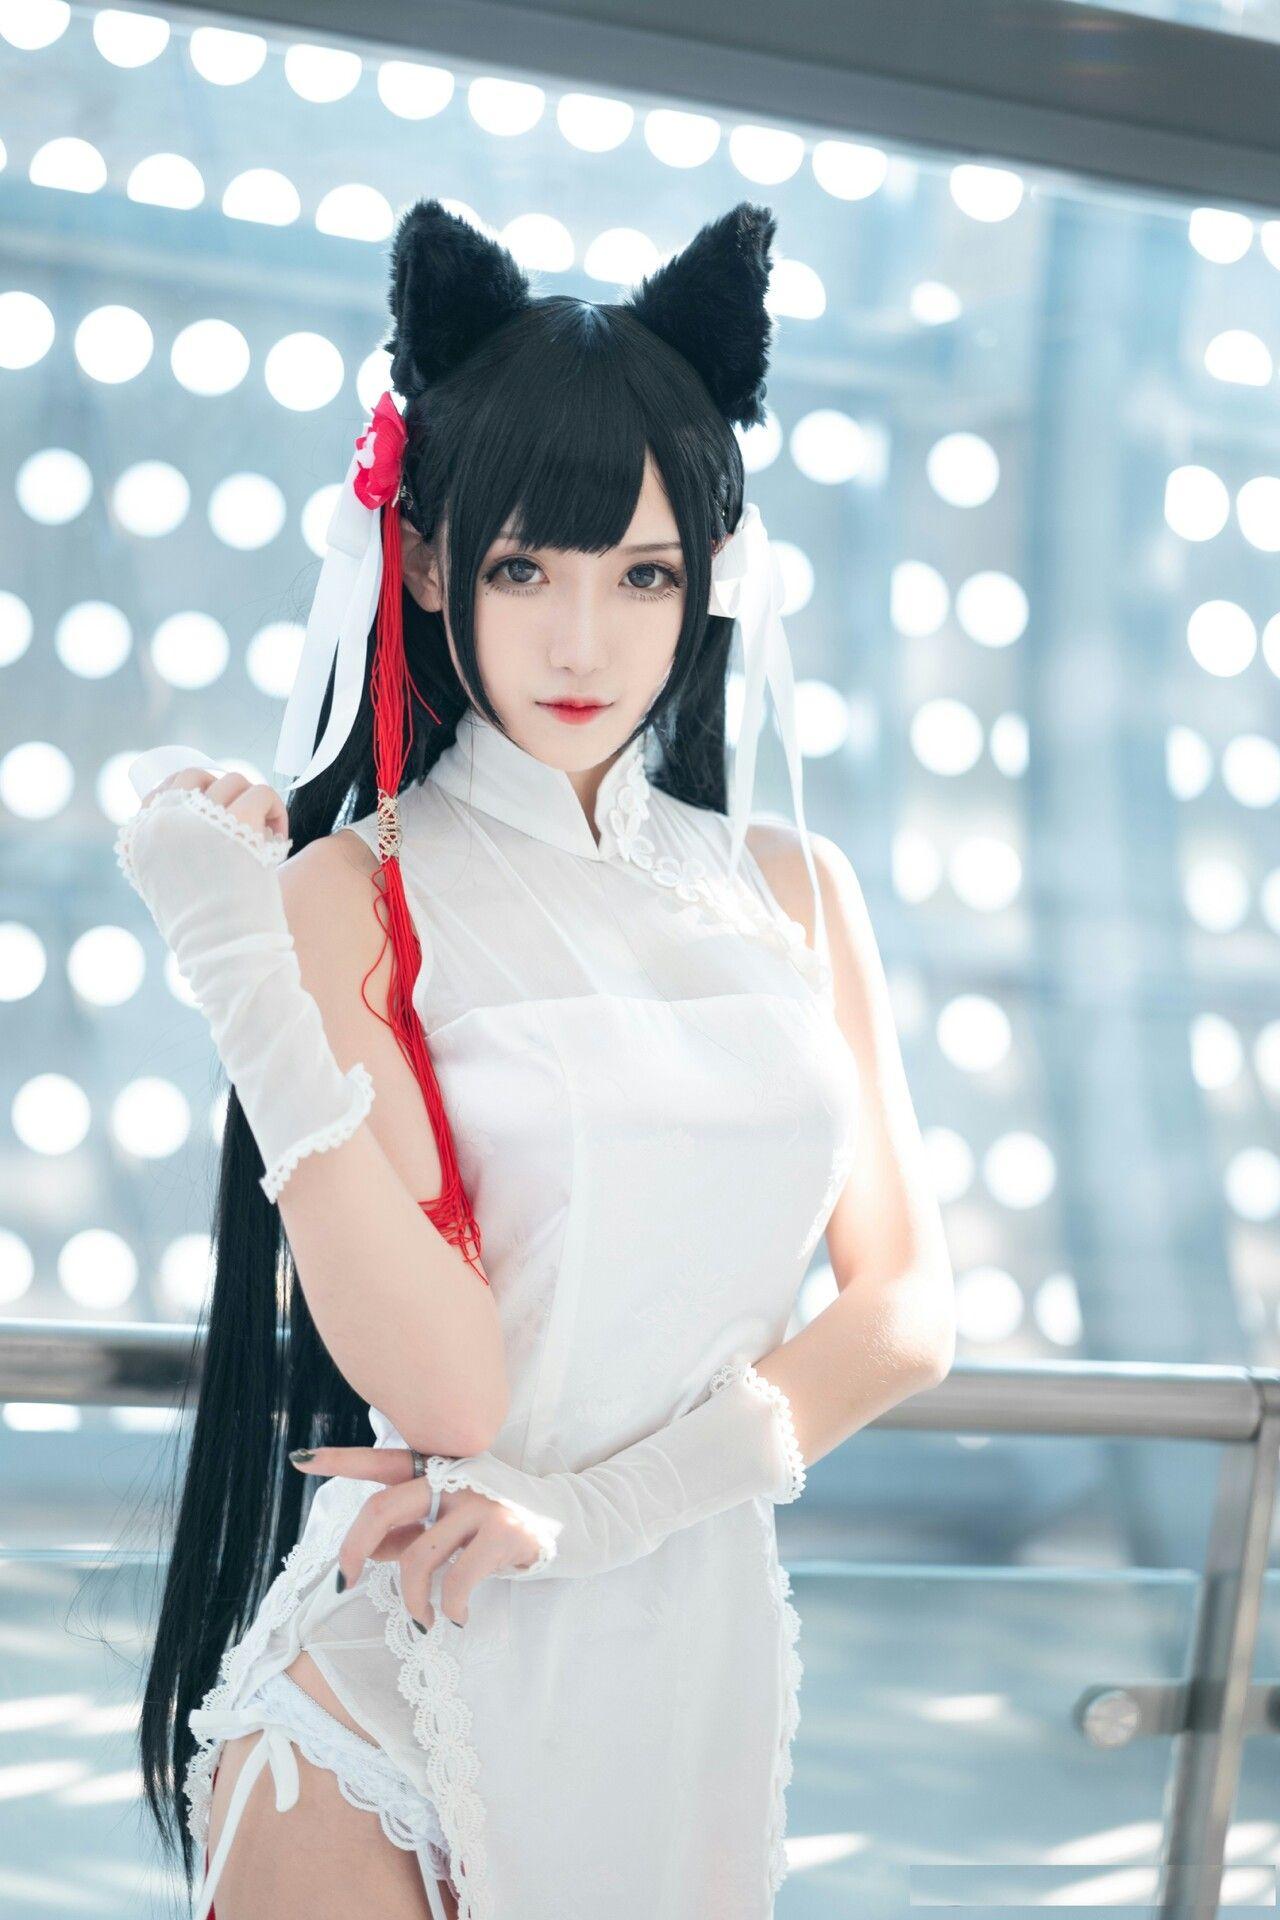 Female Cute Anime Girl Cosplay - Anime Wallpaper HD